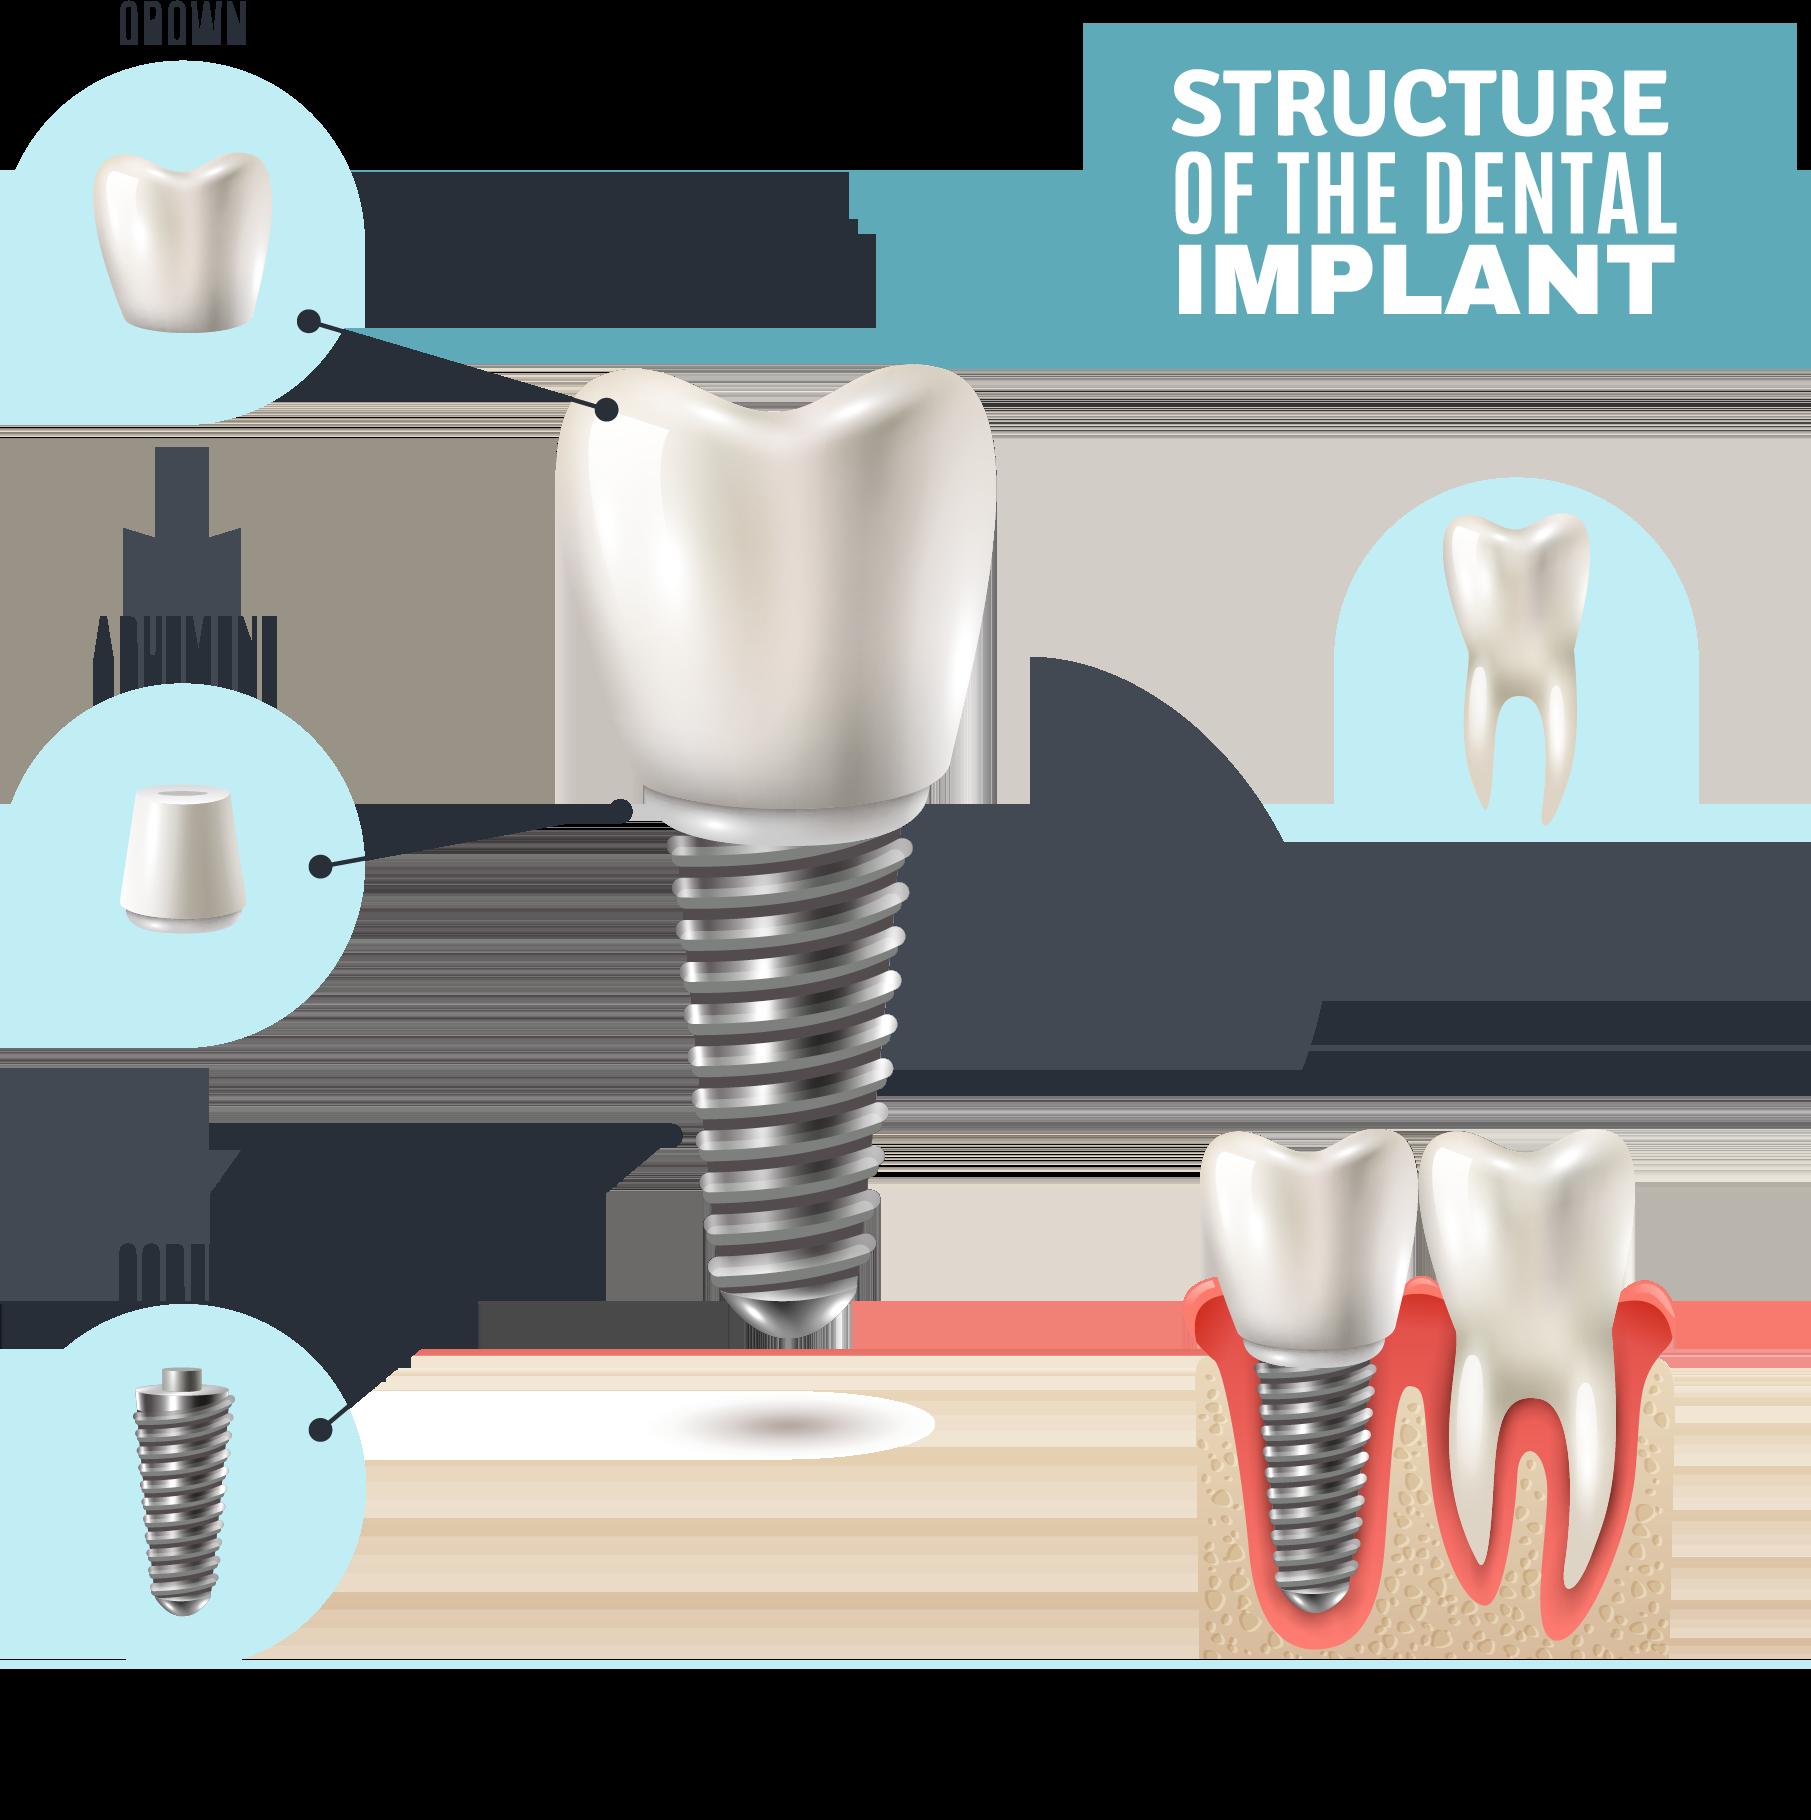 کلینیک دندانپزشکی آرکا - ساختار ایمپلنت دندان